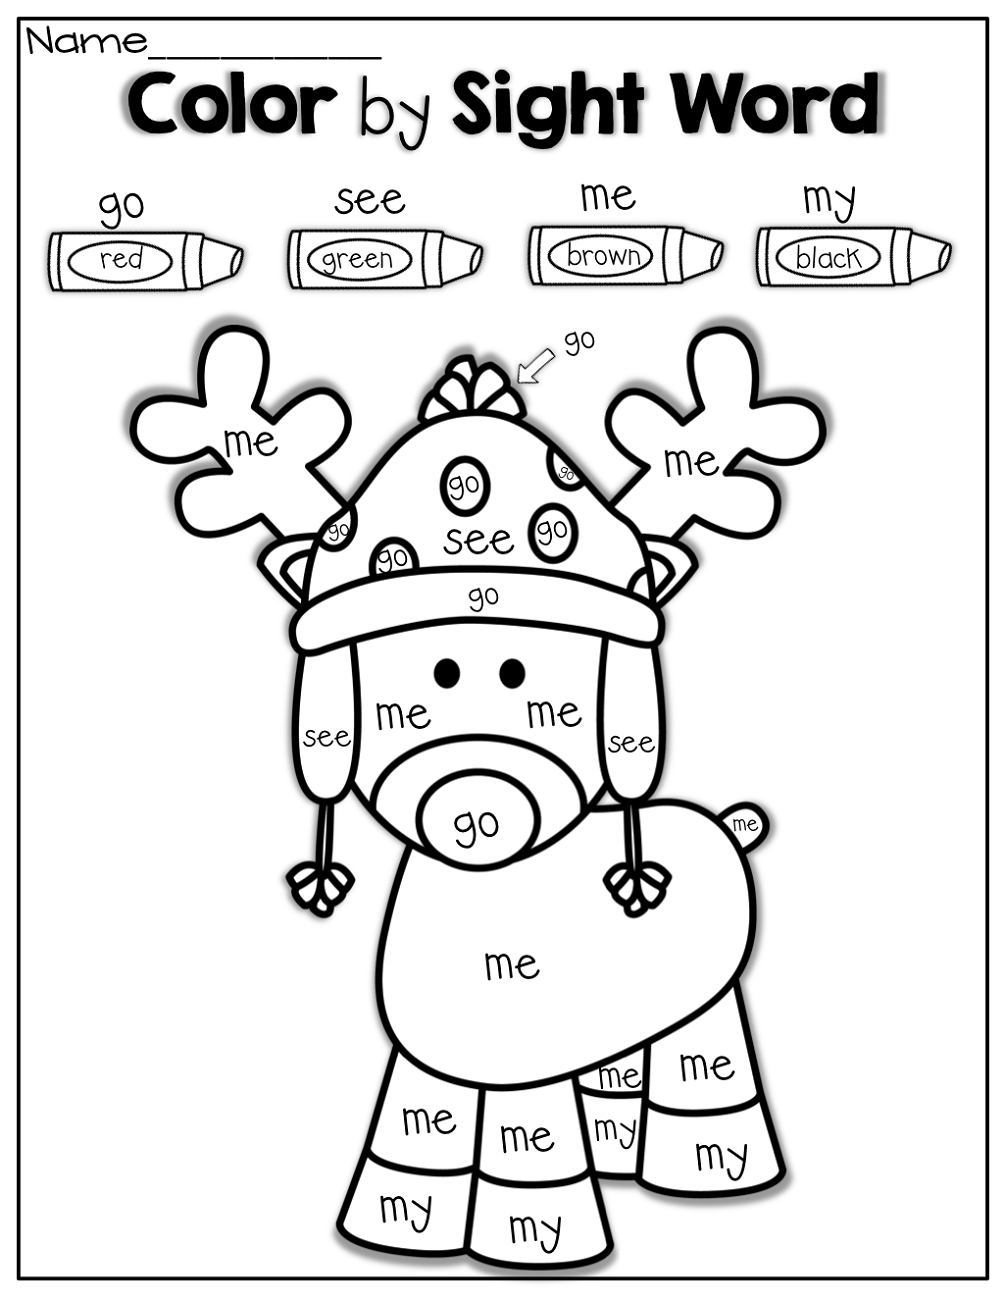 christmast children's fun activity sheets